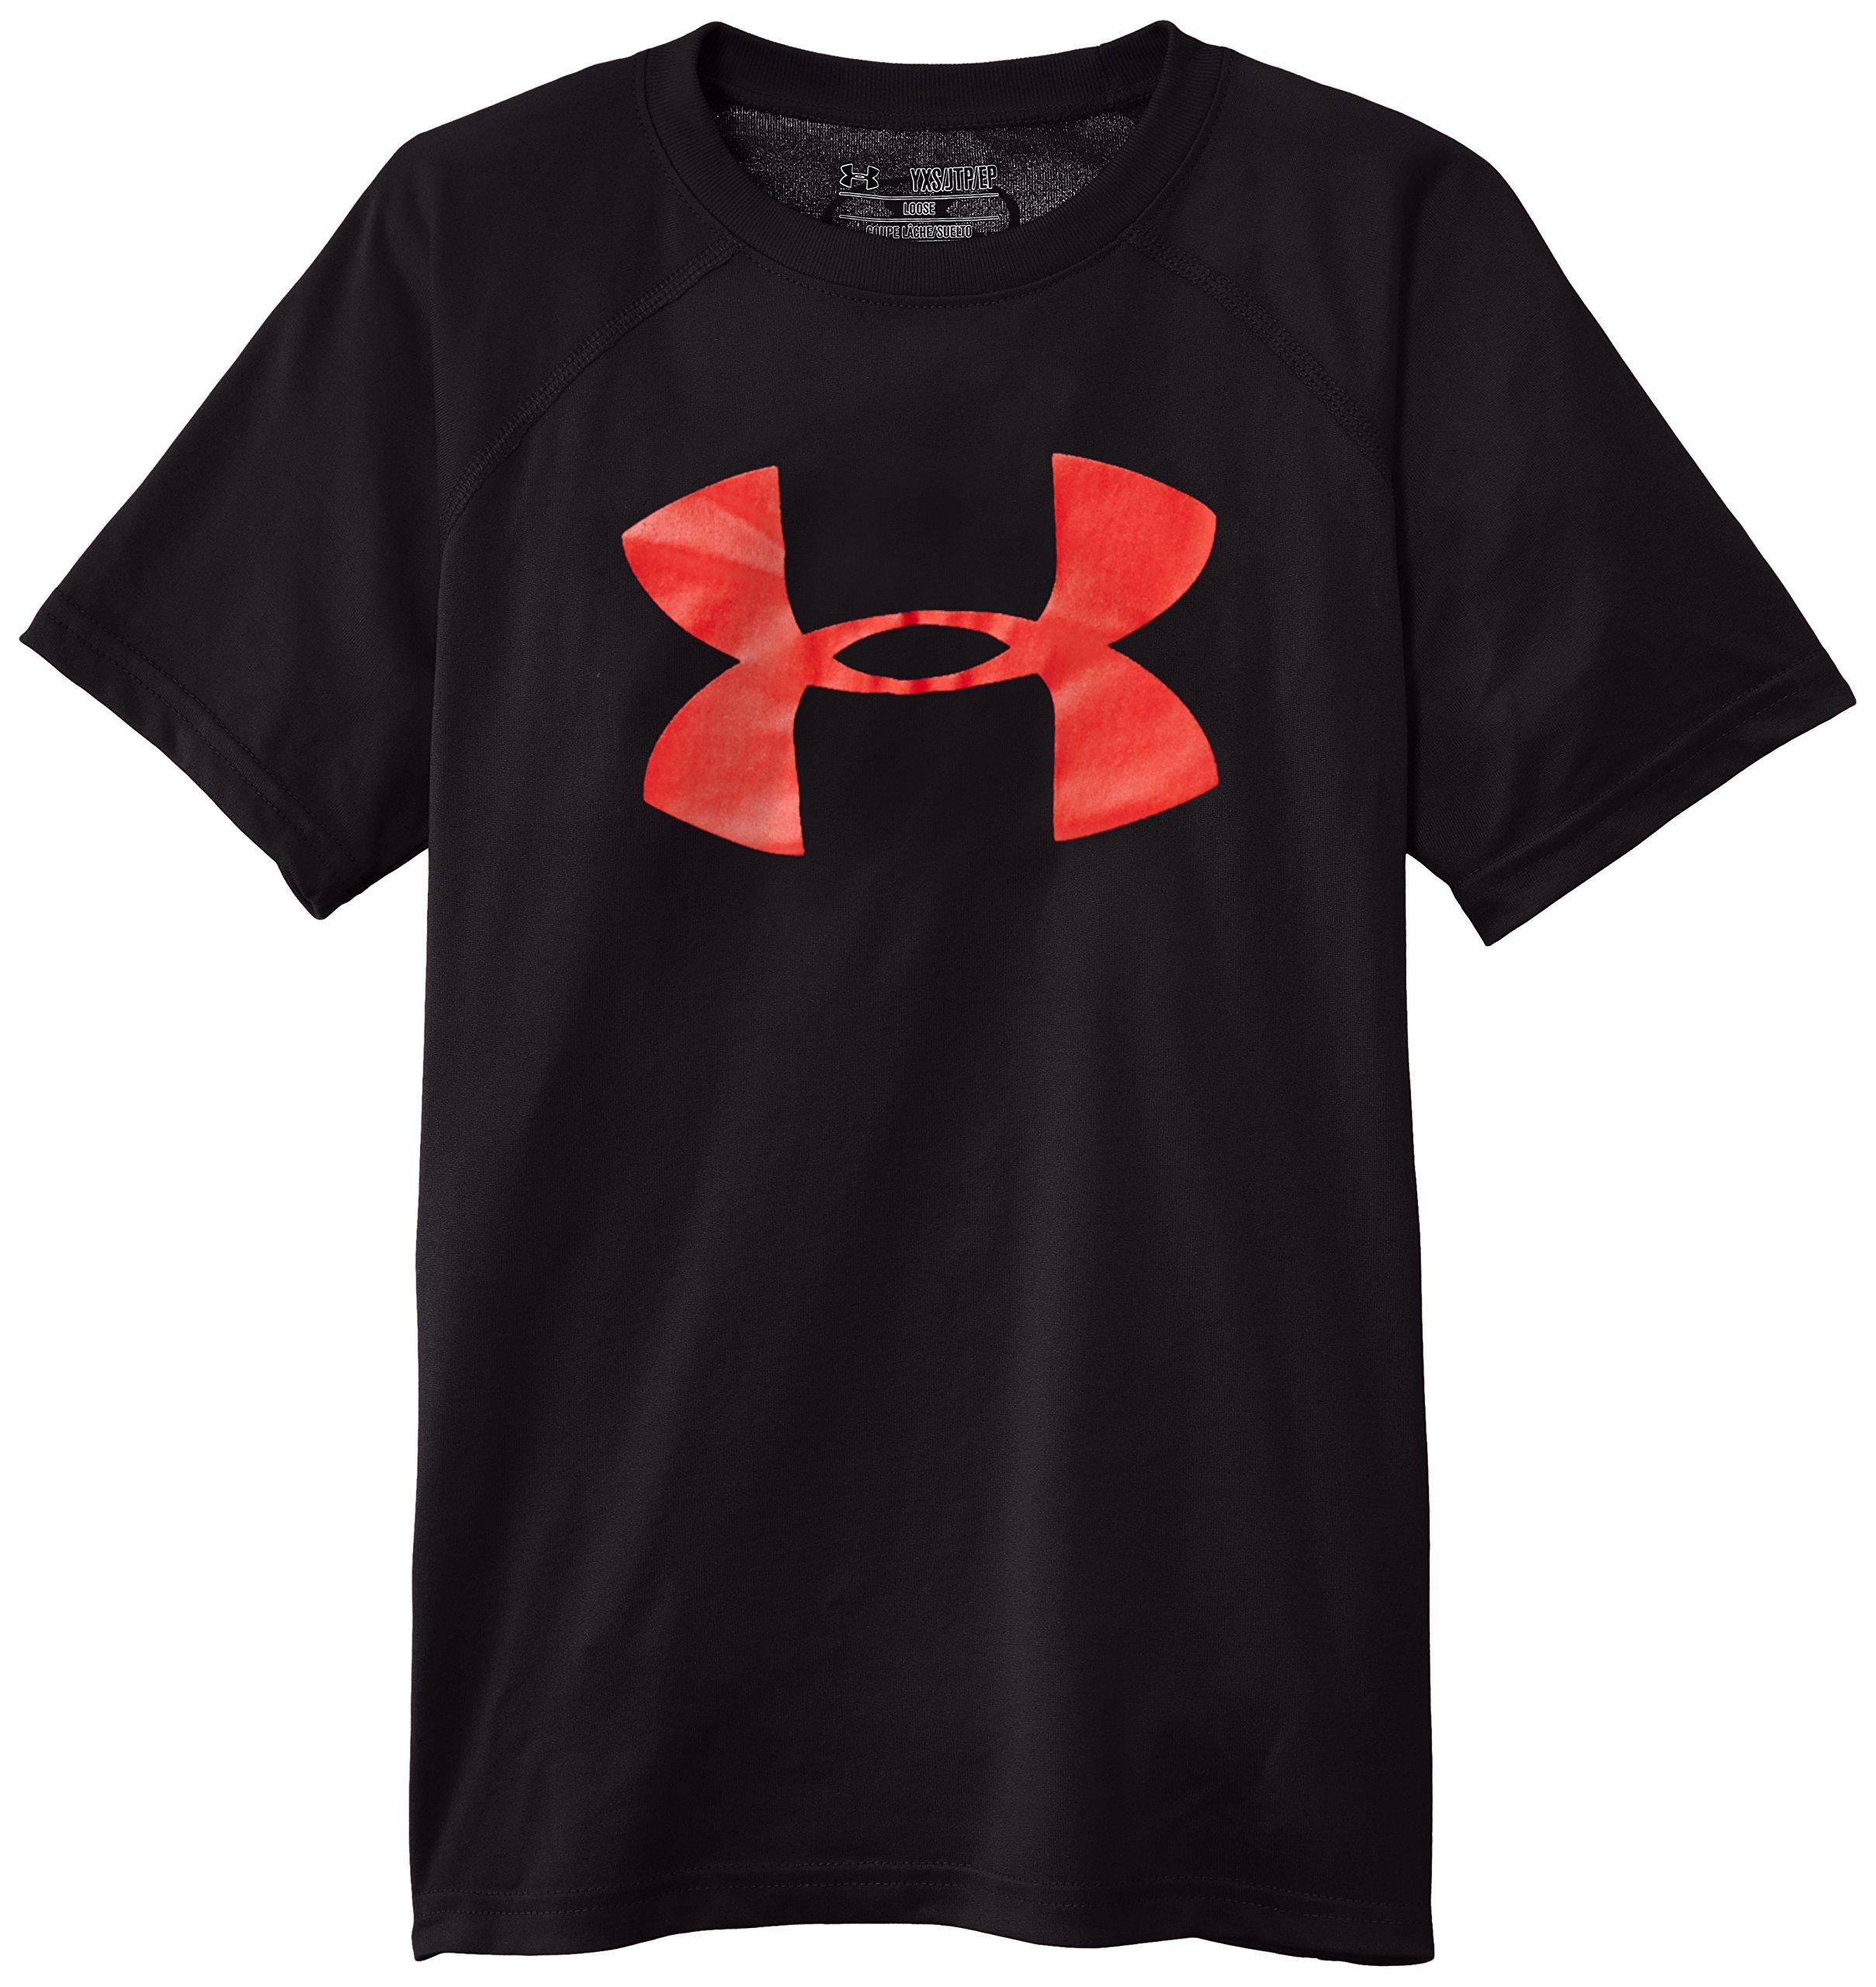 Under Armour Boys' Tech Big Logo T-Shirt, Black /Risk Red, Youth X-Small